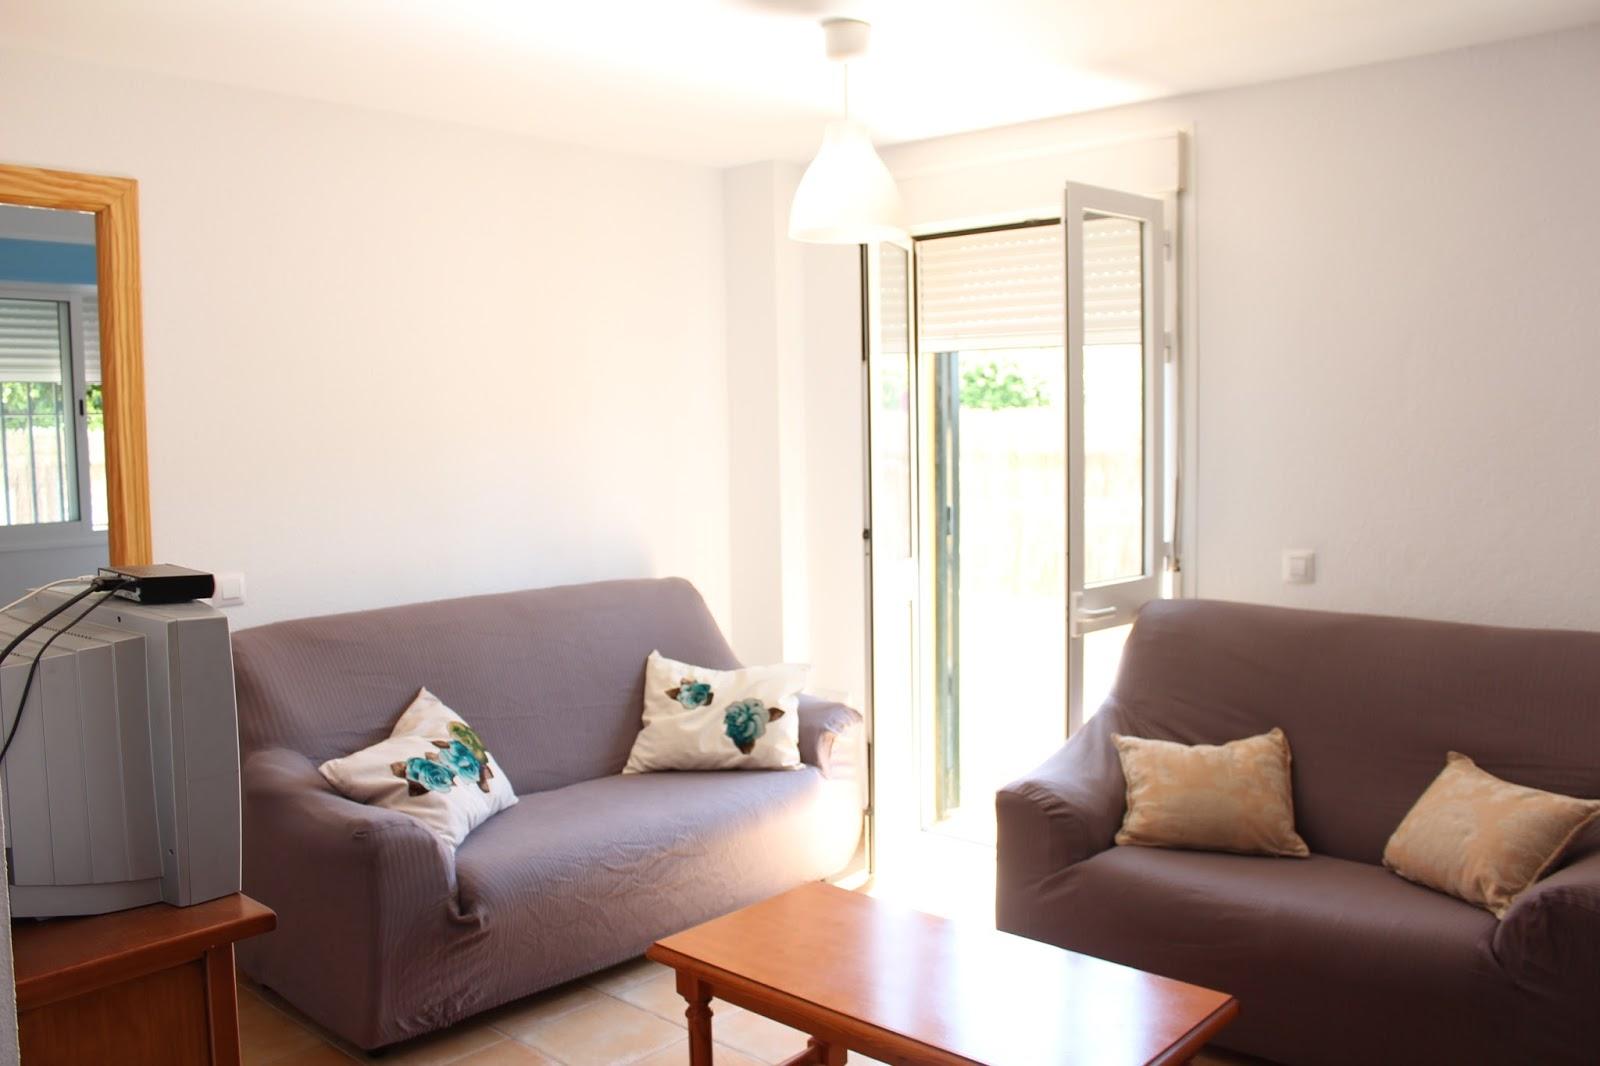 Apartamento en rota cadiz alquiler verano for Alquiler piso rota verano